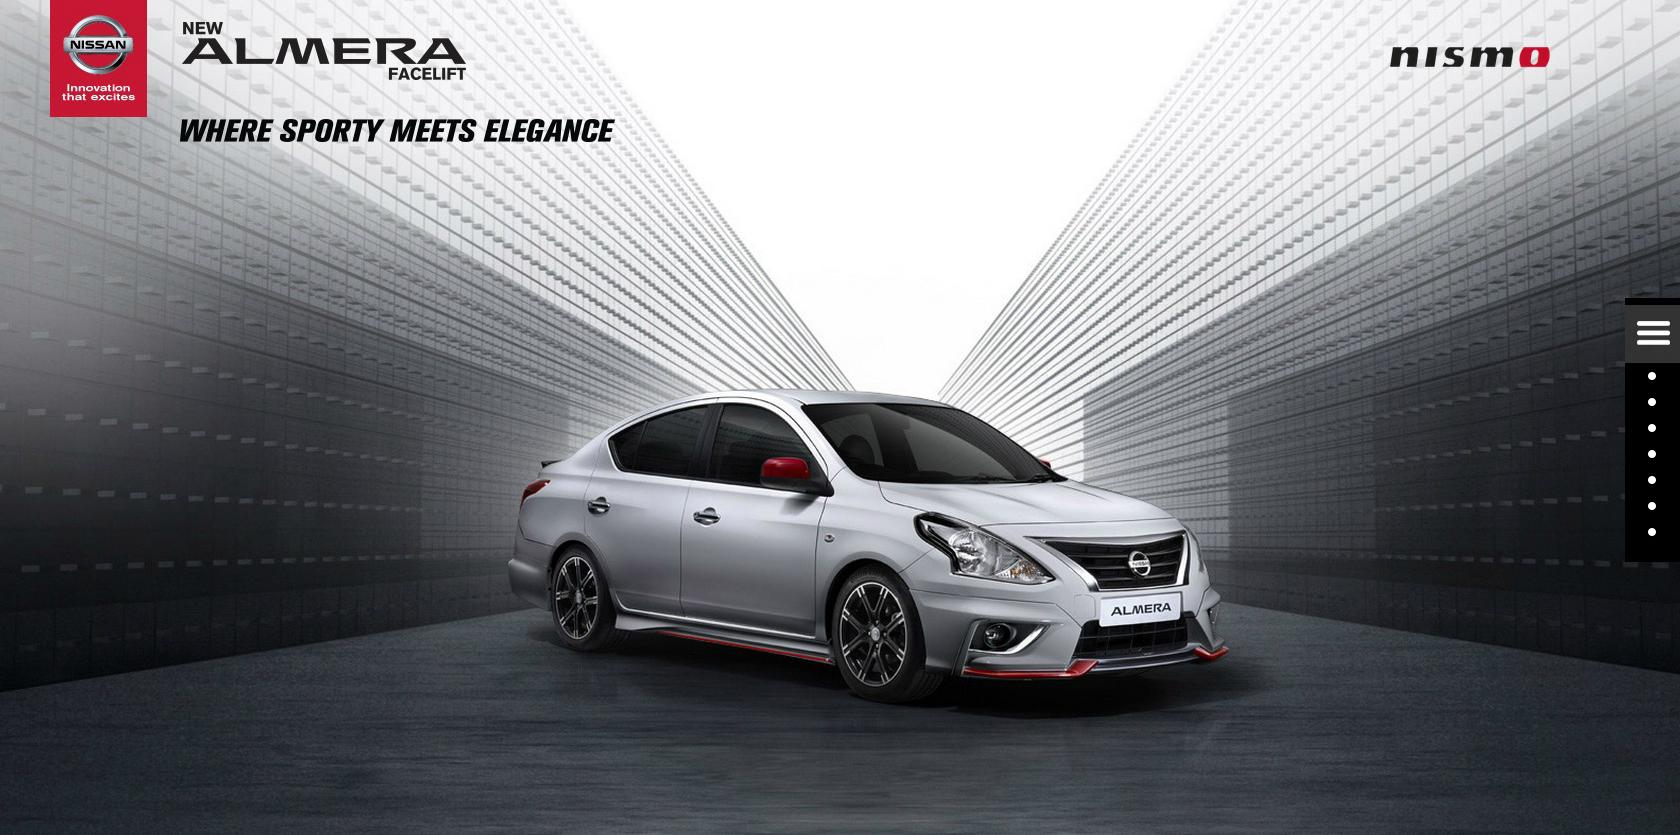 2015 Nissan Almera Nismo Performance Packs 101 Hp In